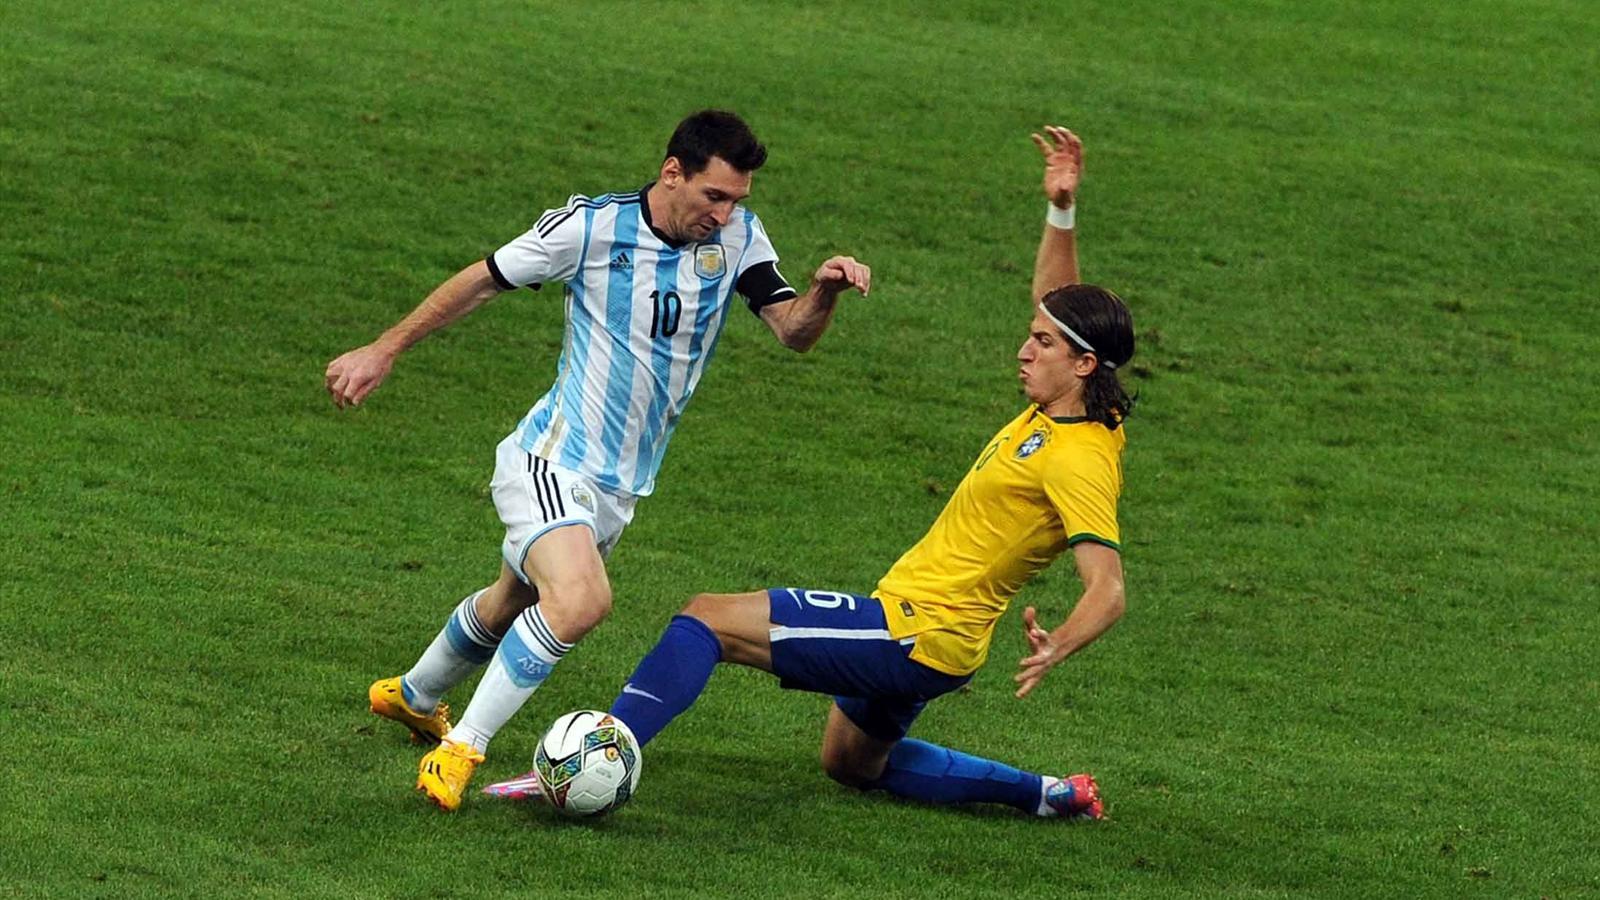 Copa America Calendrier.Infos Pratiques Et Calendrier Des Matches De La Copa America